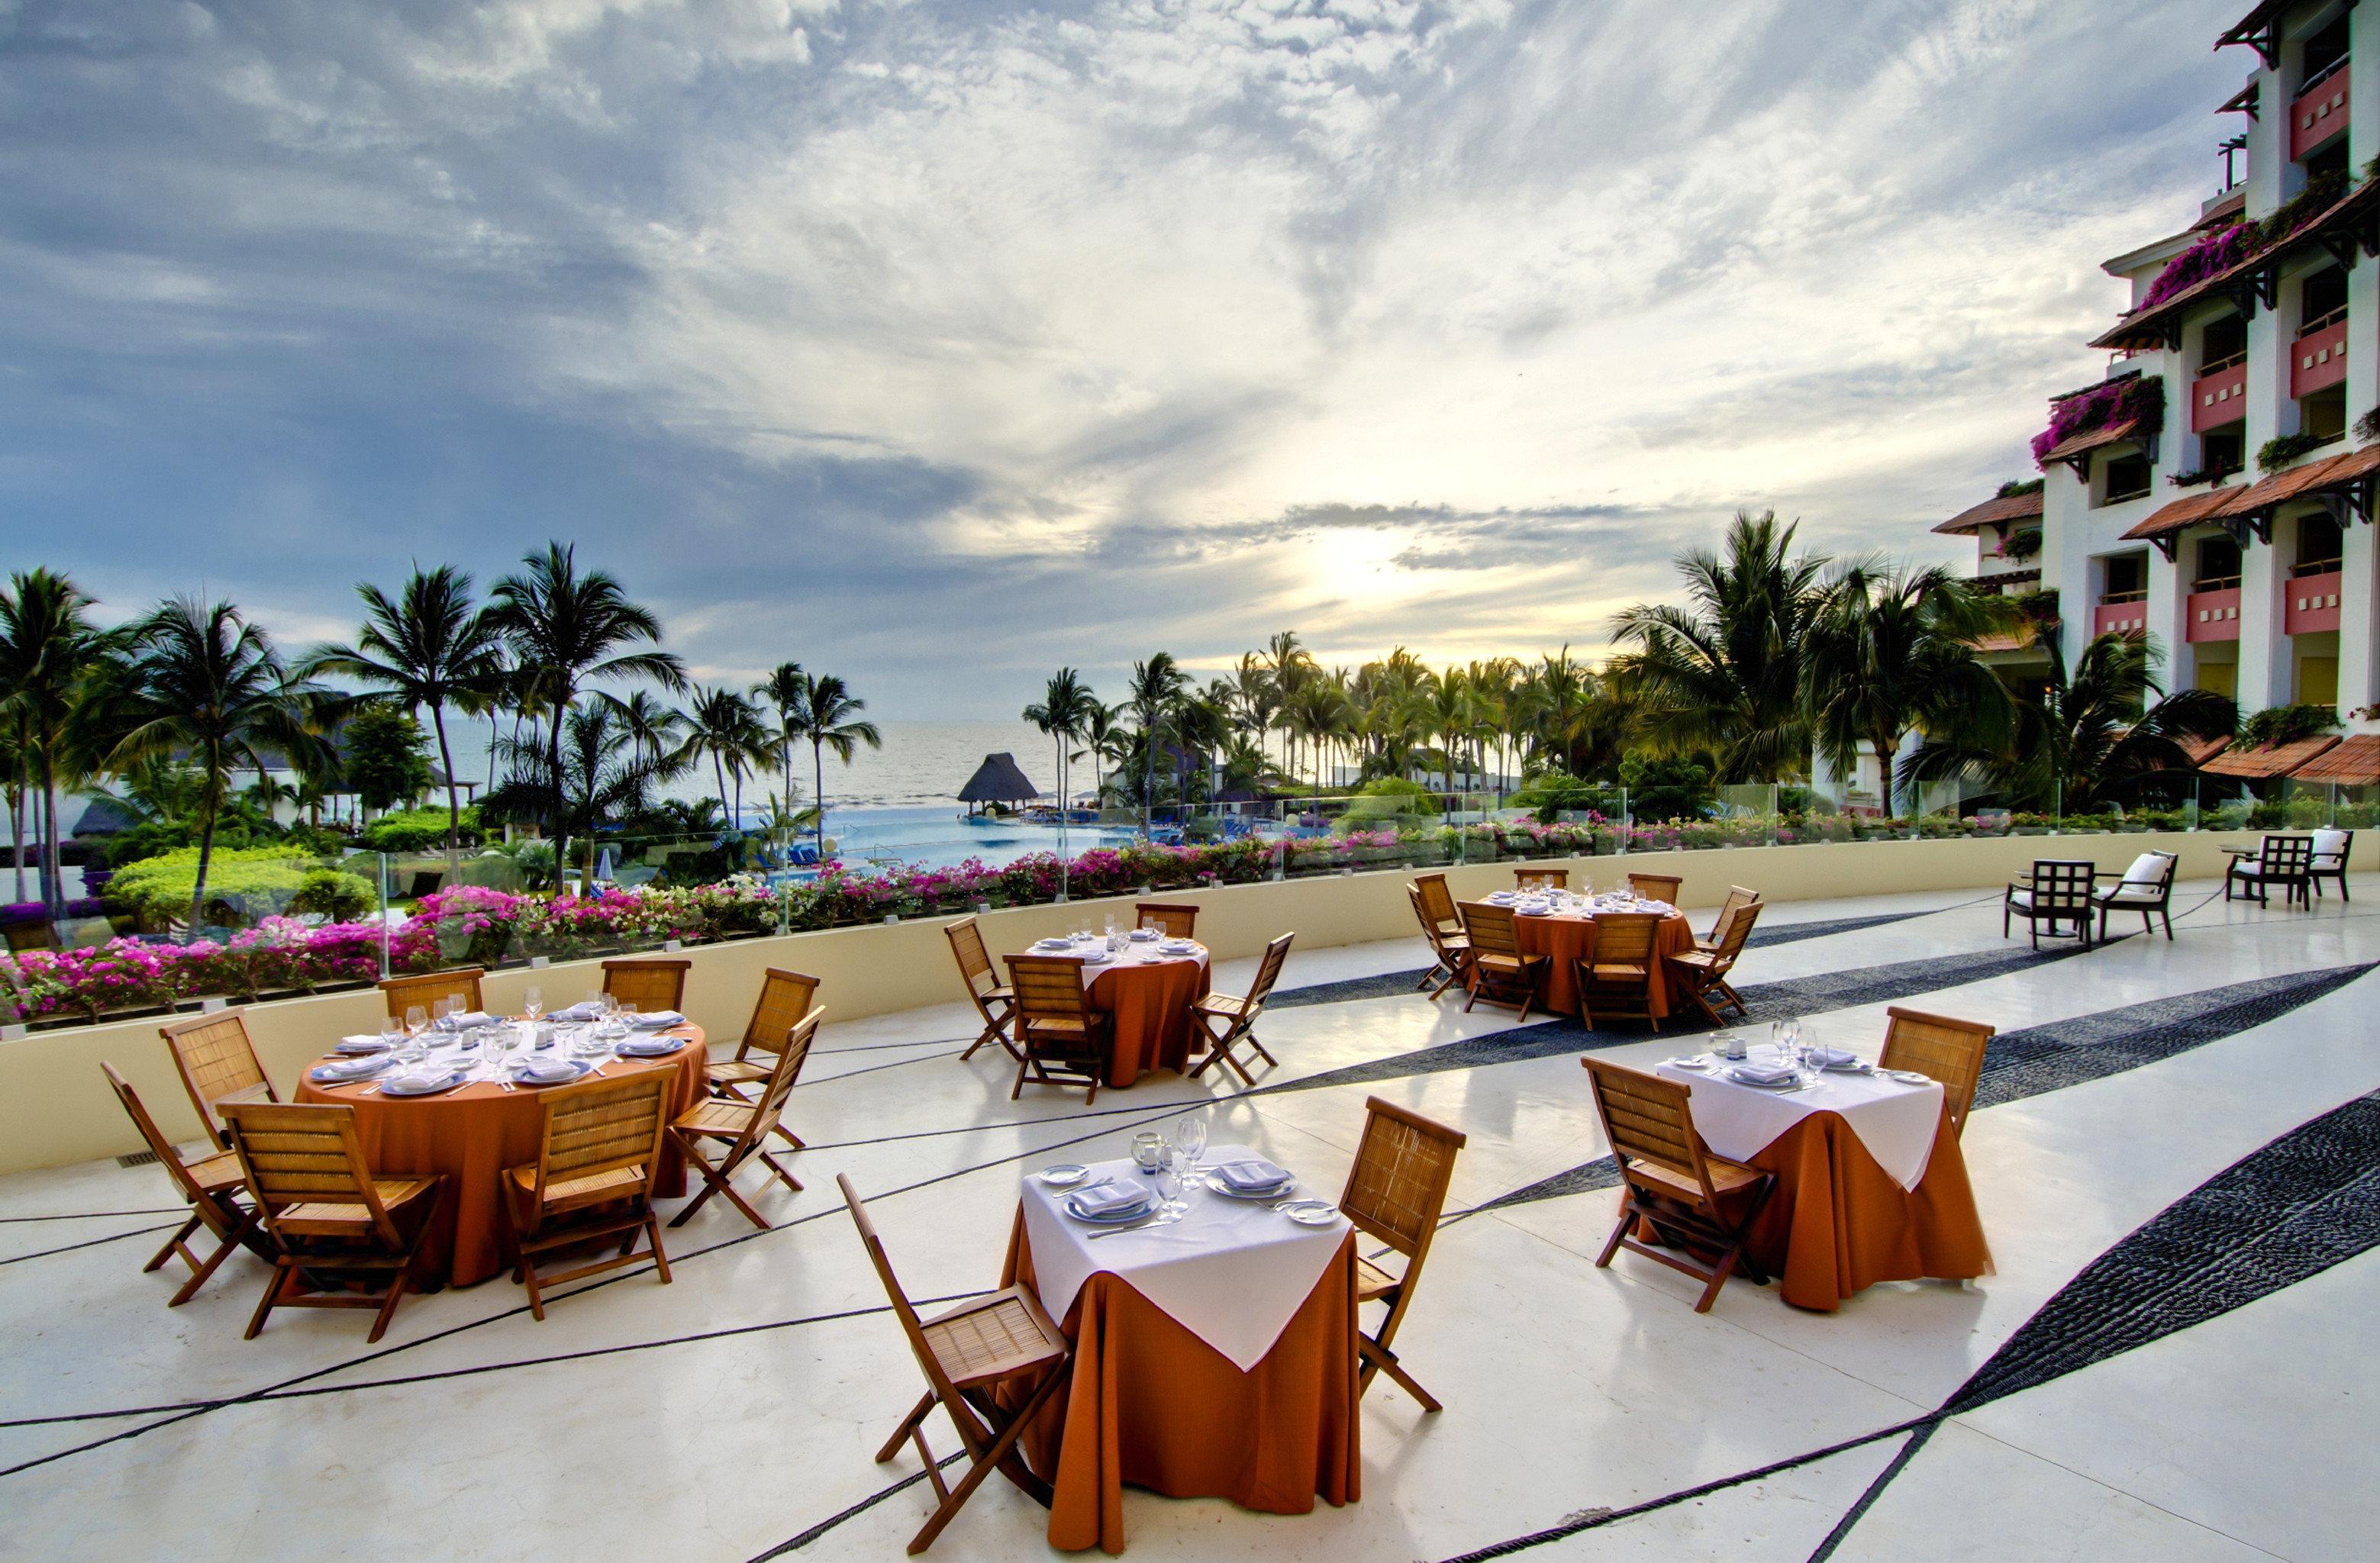 Balcony Beachfront Dining Drink Eat Hotels Outdoors Romance Romantic sky outdoor leisure chair vacation Resort Beach restaurant estate furniture